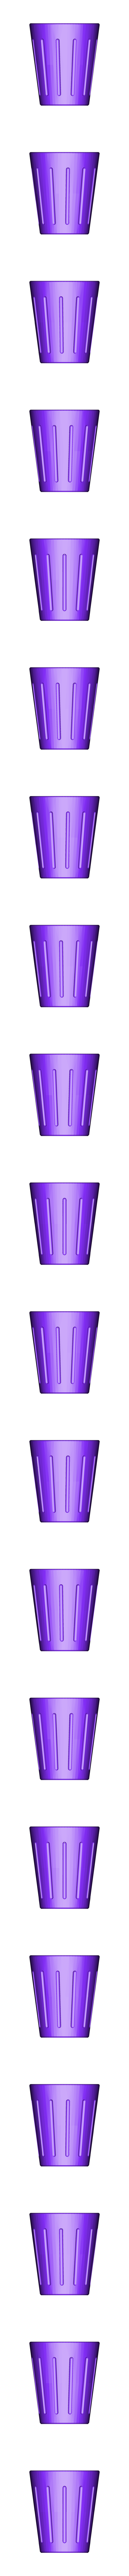 Dribble_Glass_001.STL Download free STL file The Dribble Glass • 3D printer template, Tarnliare